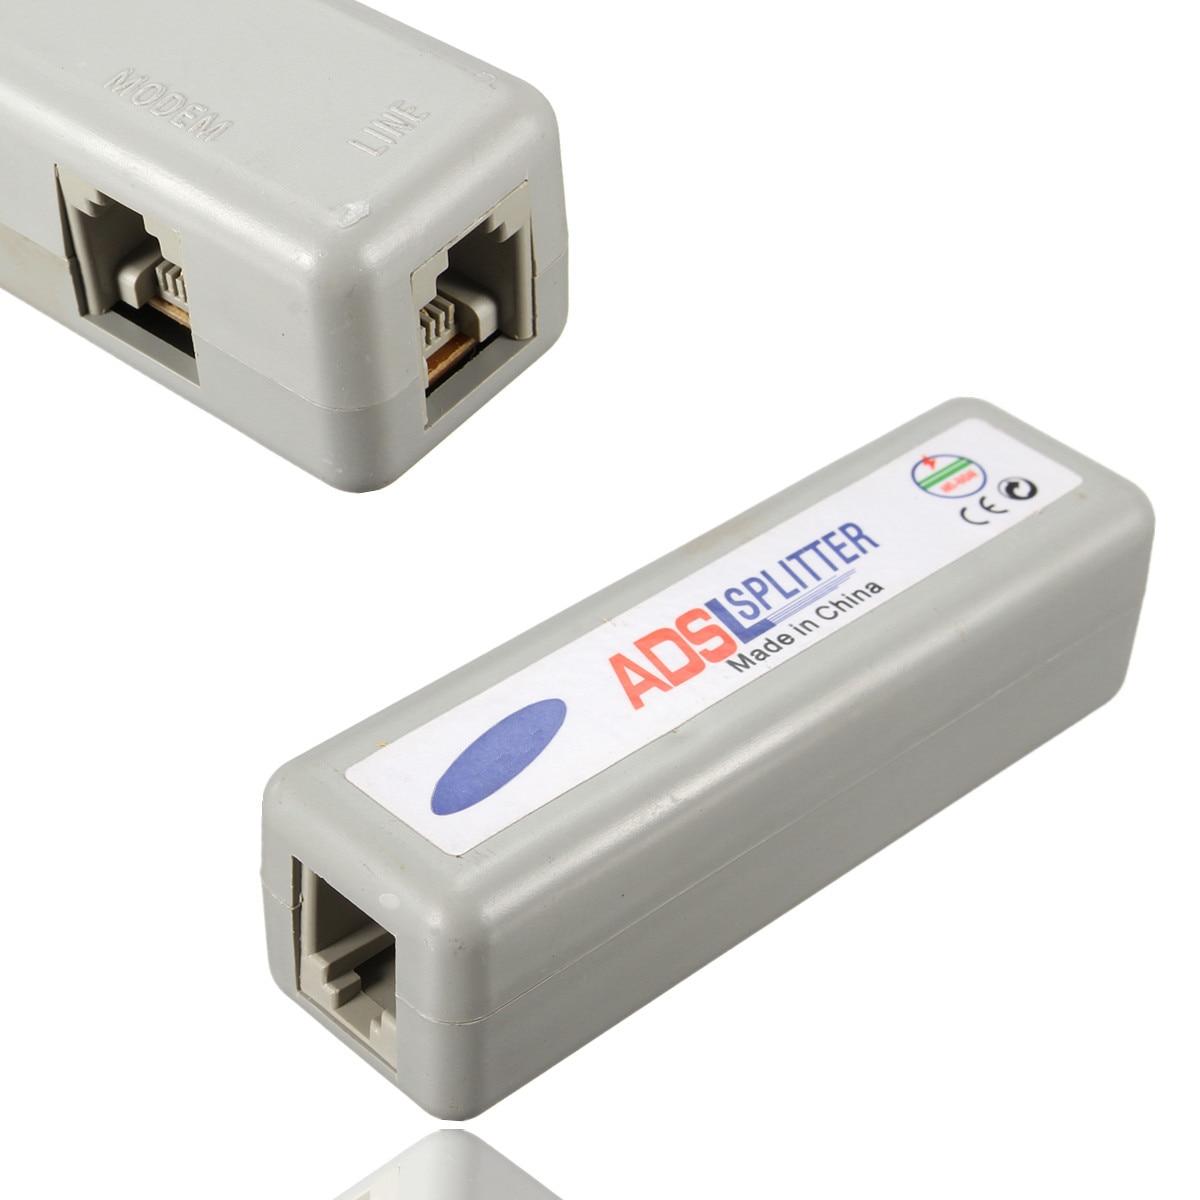 Wholesale RJ11 ADSL Line Splitter Fax Modem Broadband Phone Network Jack Noise Filter High Quality